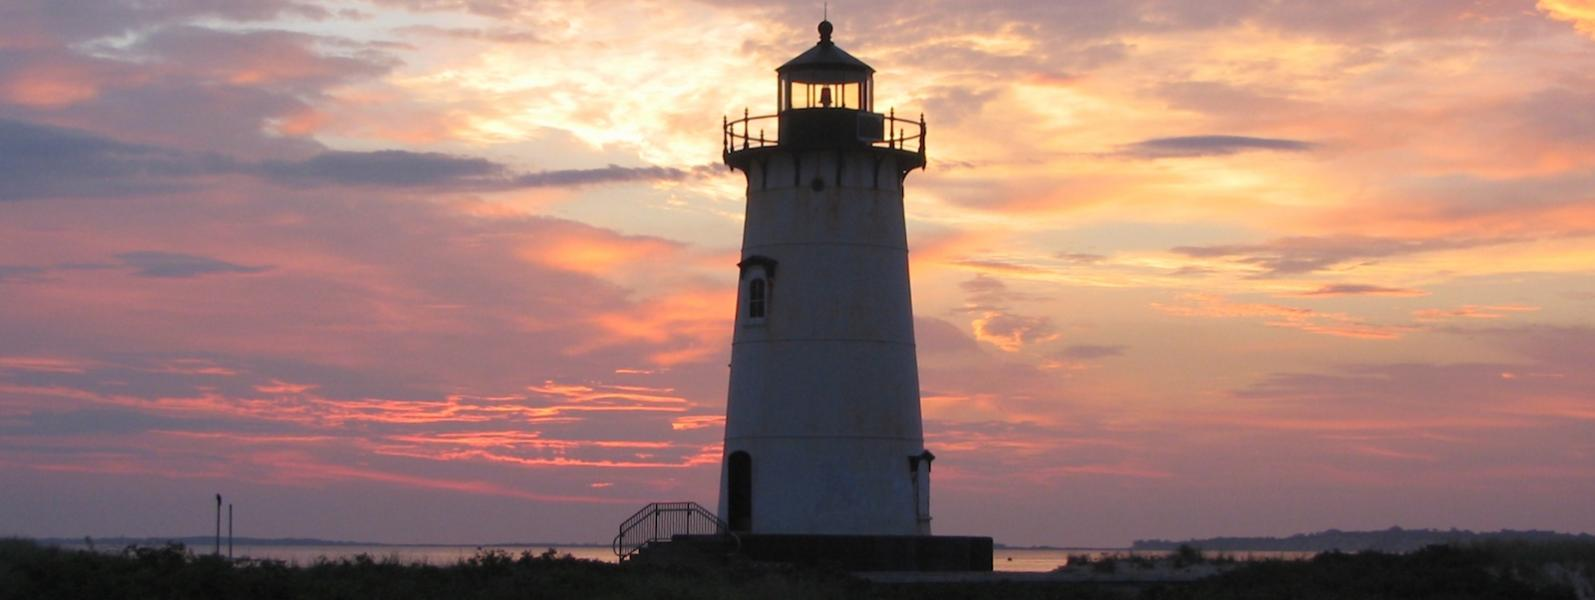 Edgartown Lighthouse at Sunset